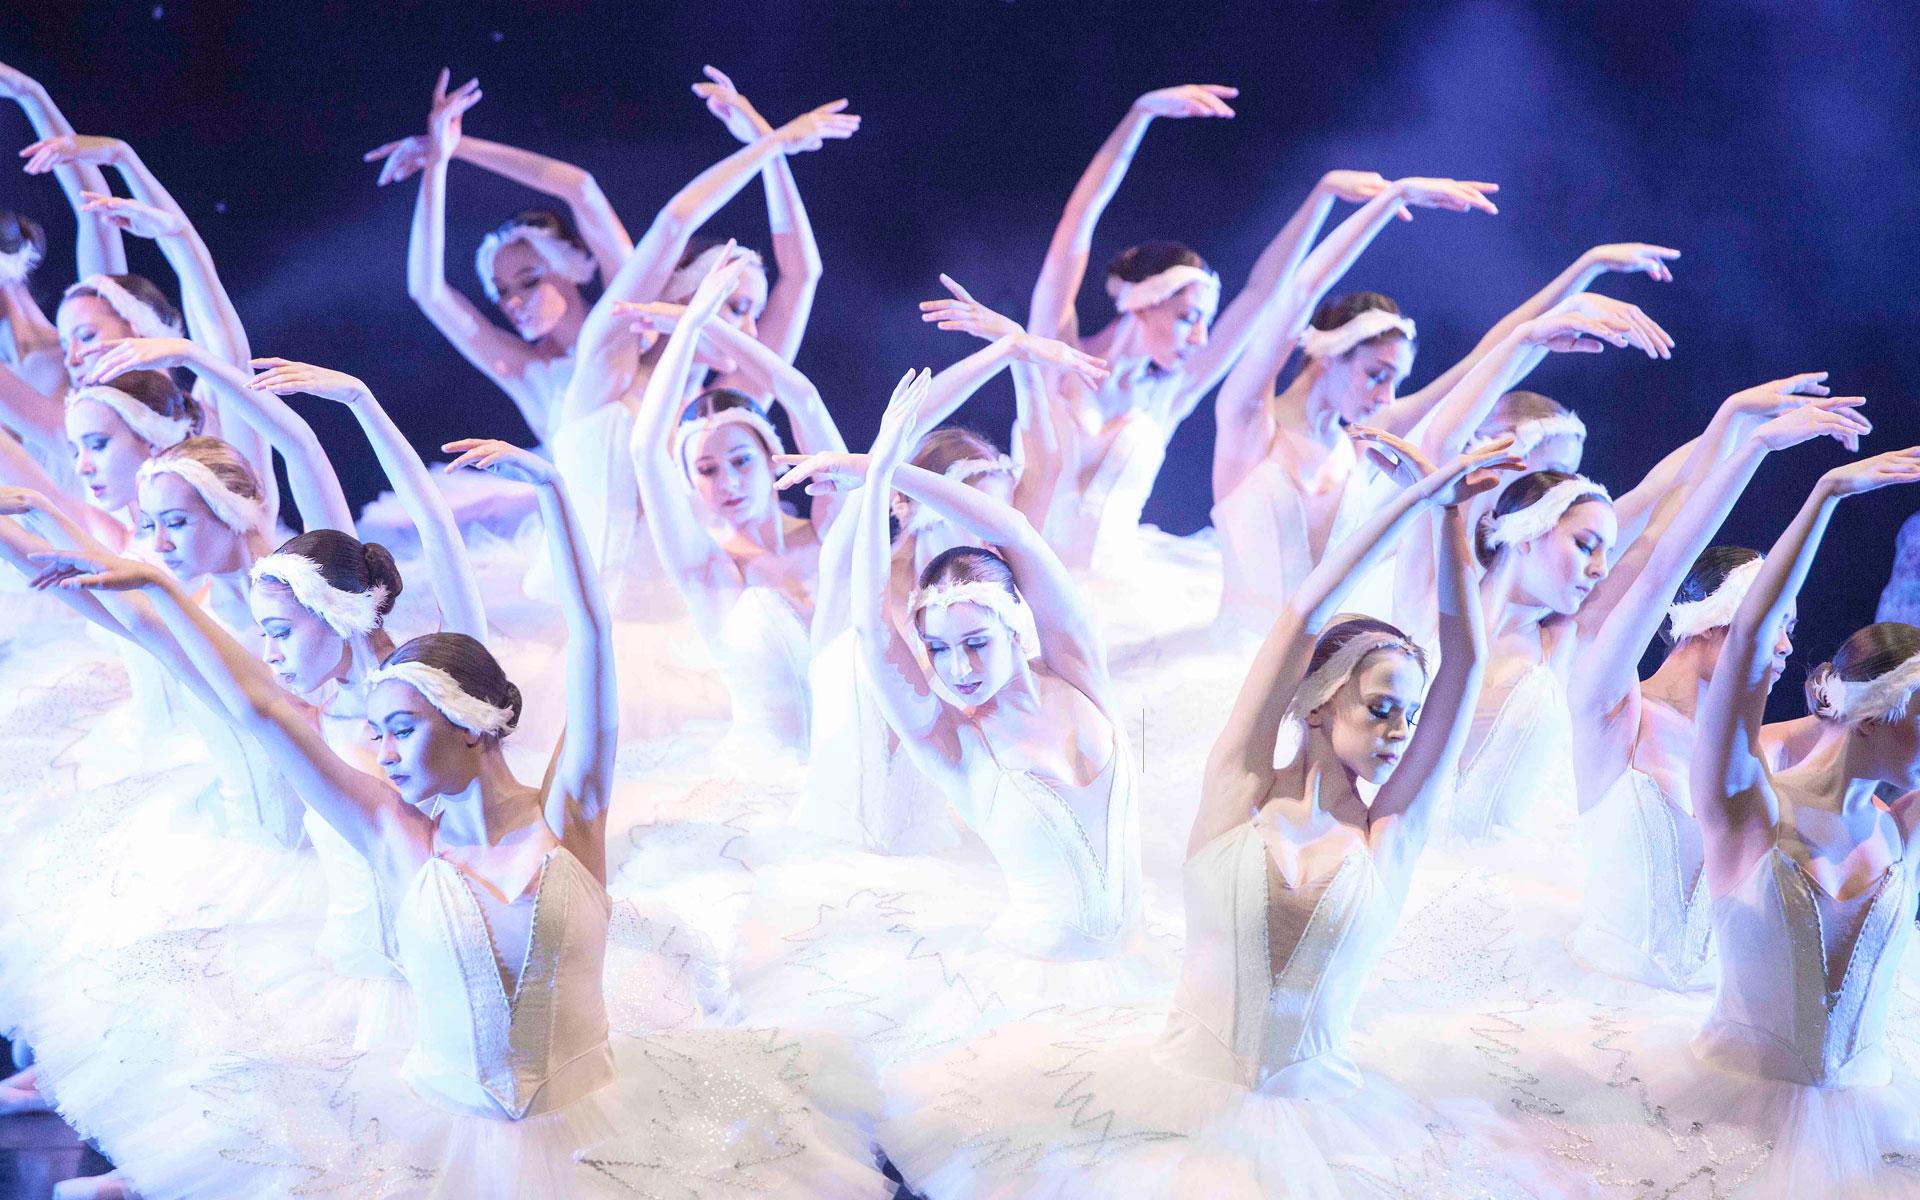 Swan Lake by Ballet West, Genting